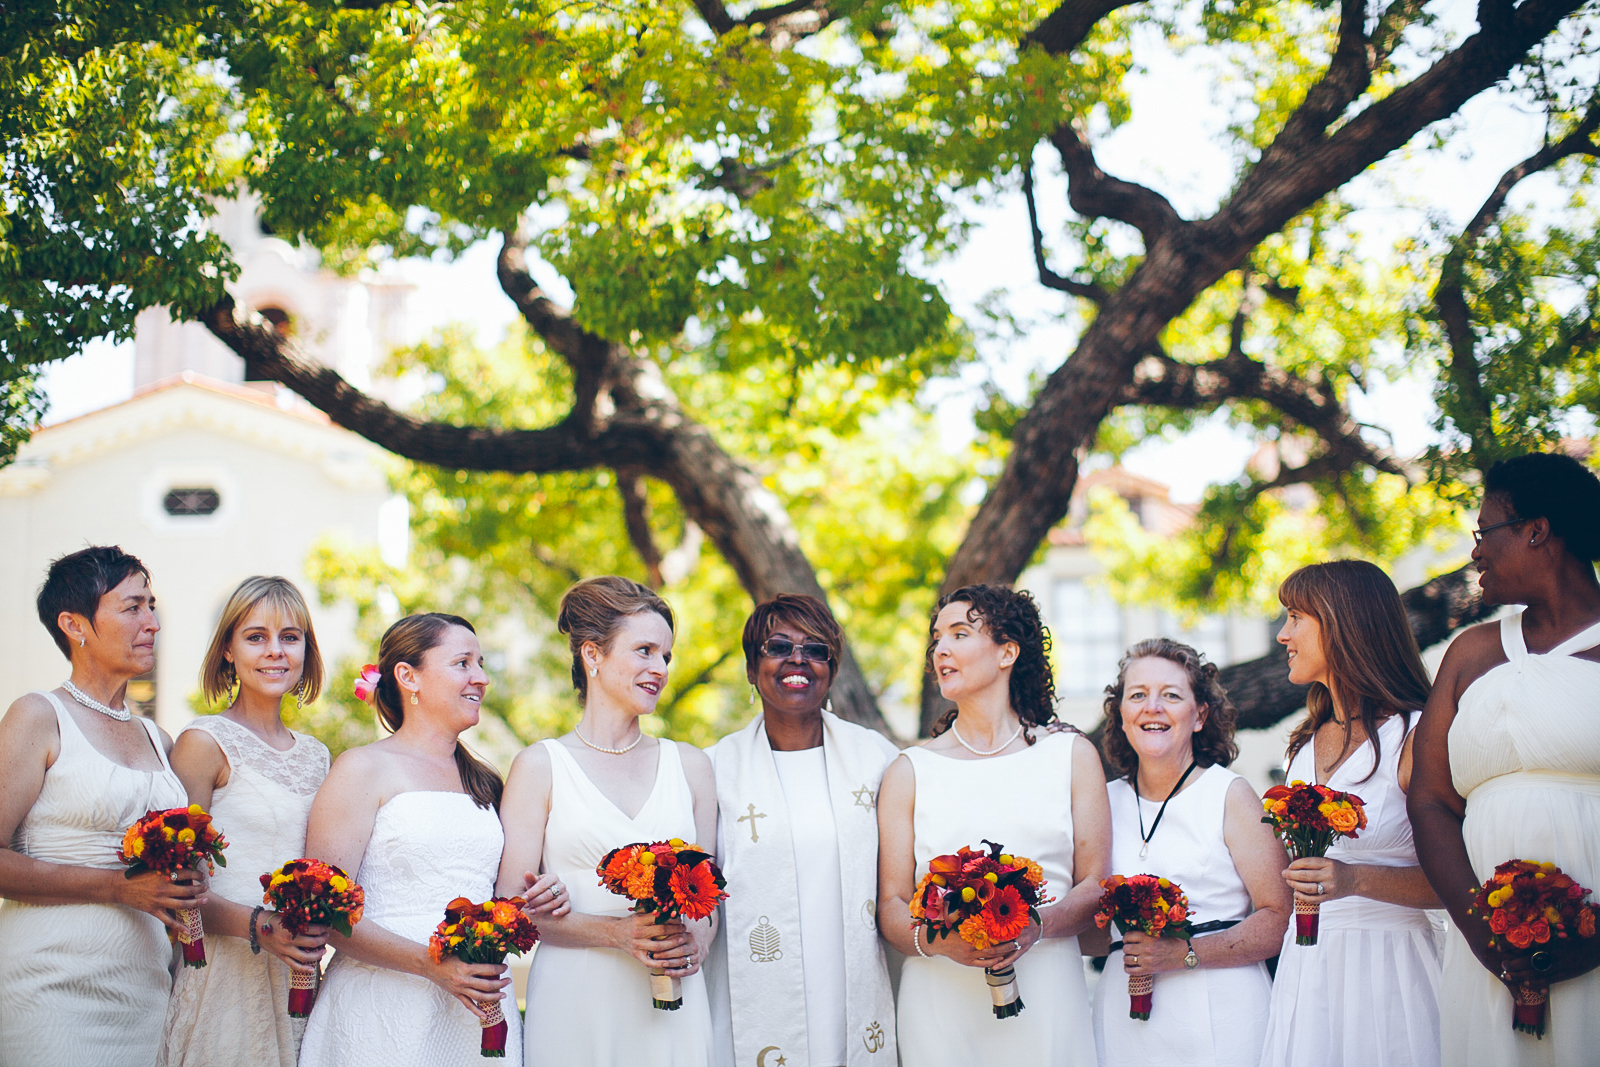 Riverside_ca_wedding_photography_marguerite_carolyn_ebony_siovhan_bokeh_photography_43.jpg